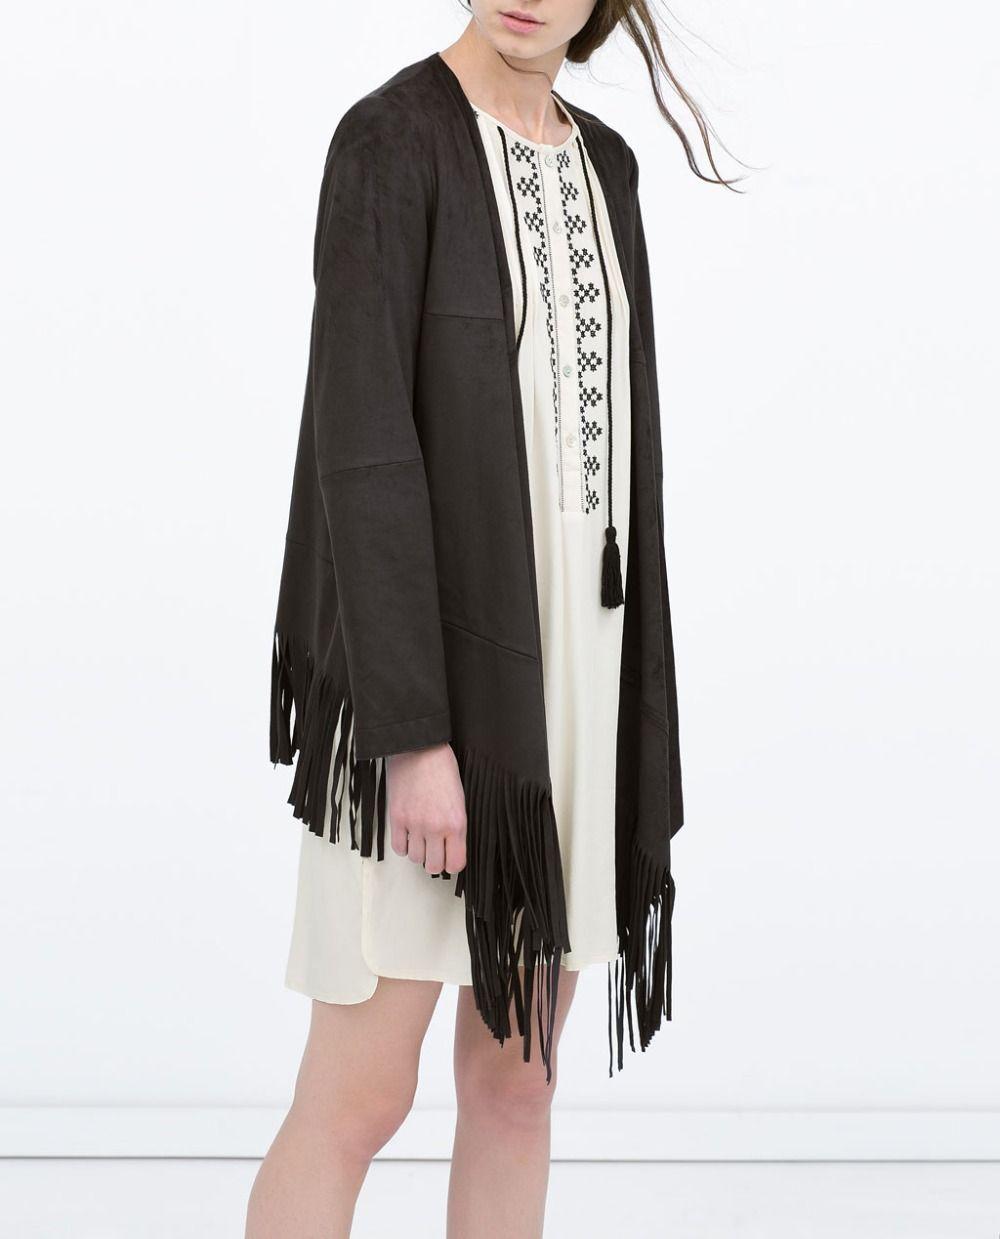 Trendy-Women-s-2015-New-Irregular-Asymmetric-Suede-Faux-Fur-Tassels-Fringed-Cardigan-Casual-Cape-Jacket.jpg (1000×1239)